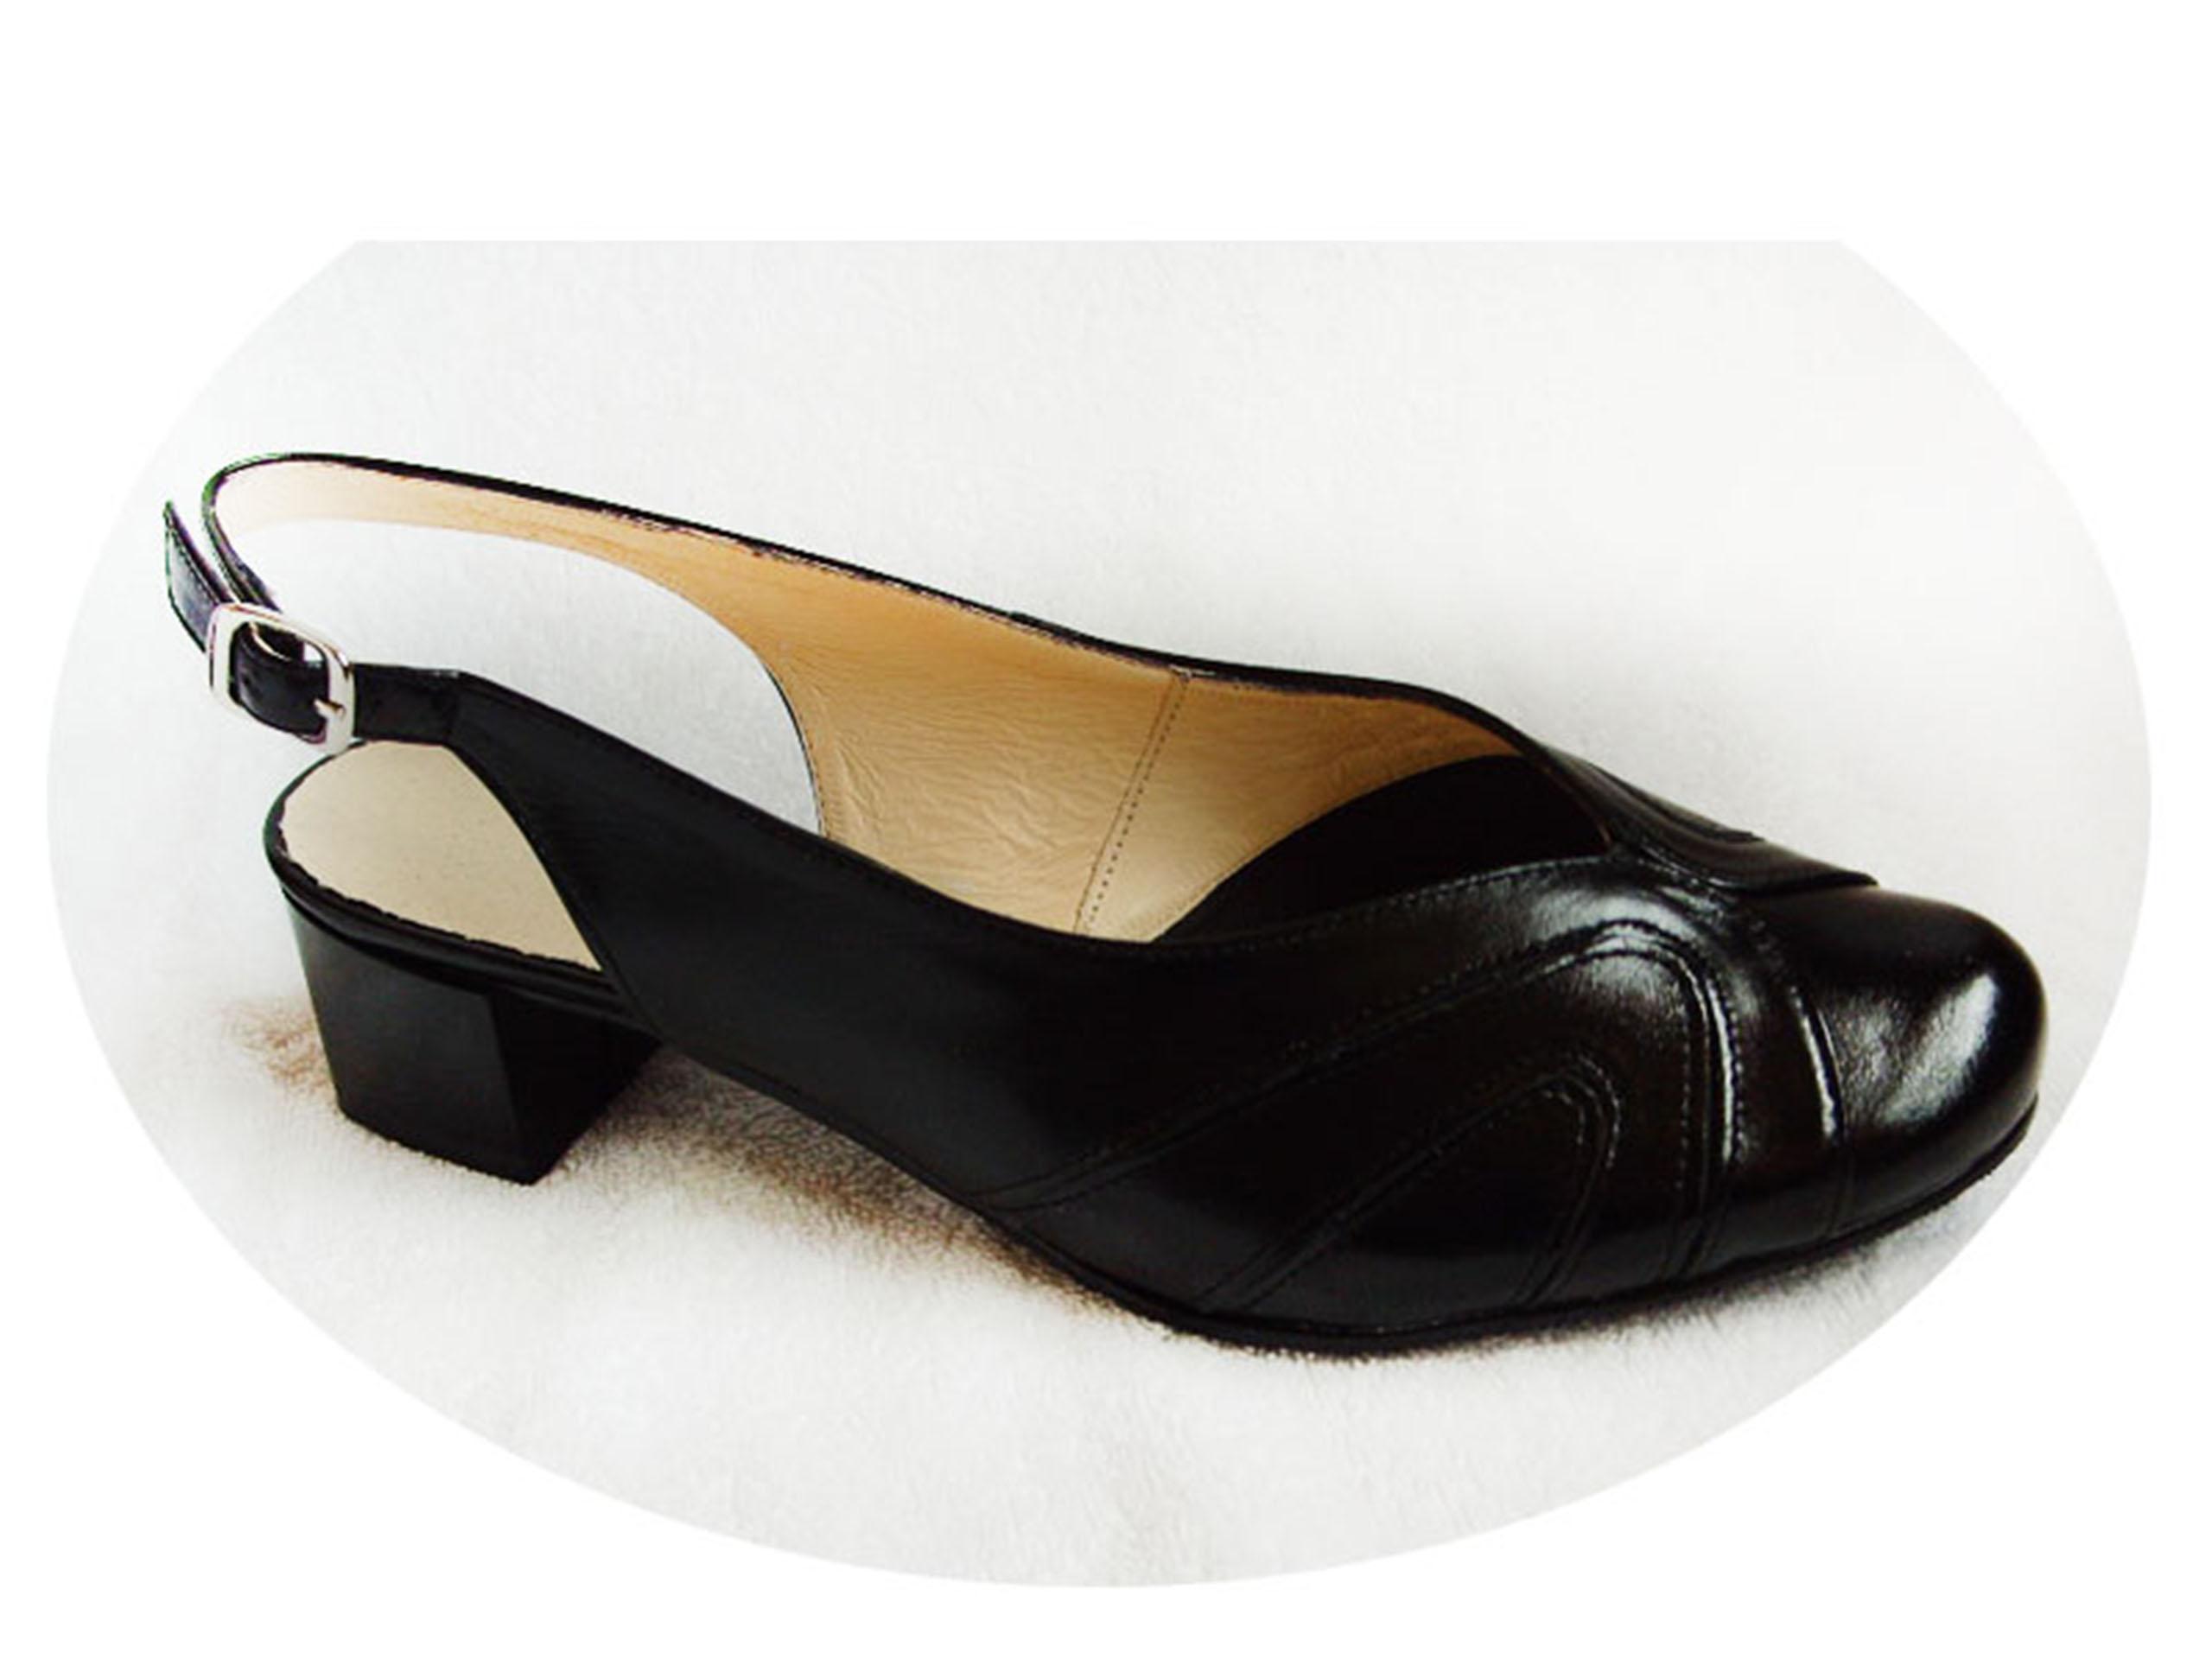 40e492c4ddf39 SKÓRZANE sandały TĘGOŚĆ H HALUKSY 42 6829946337 - Allegro.pl